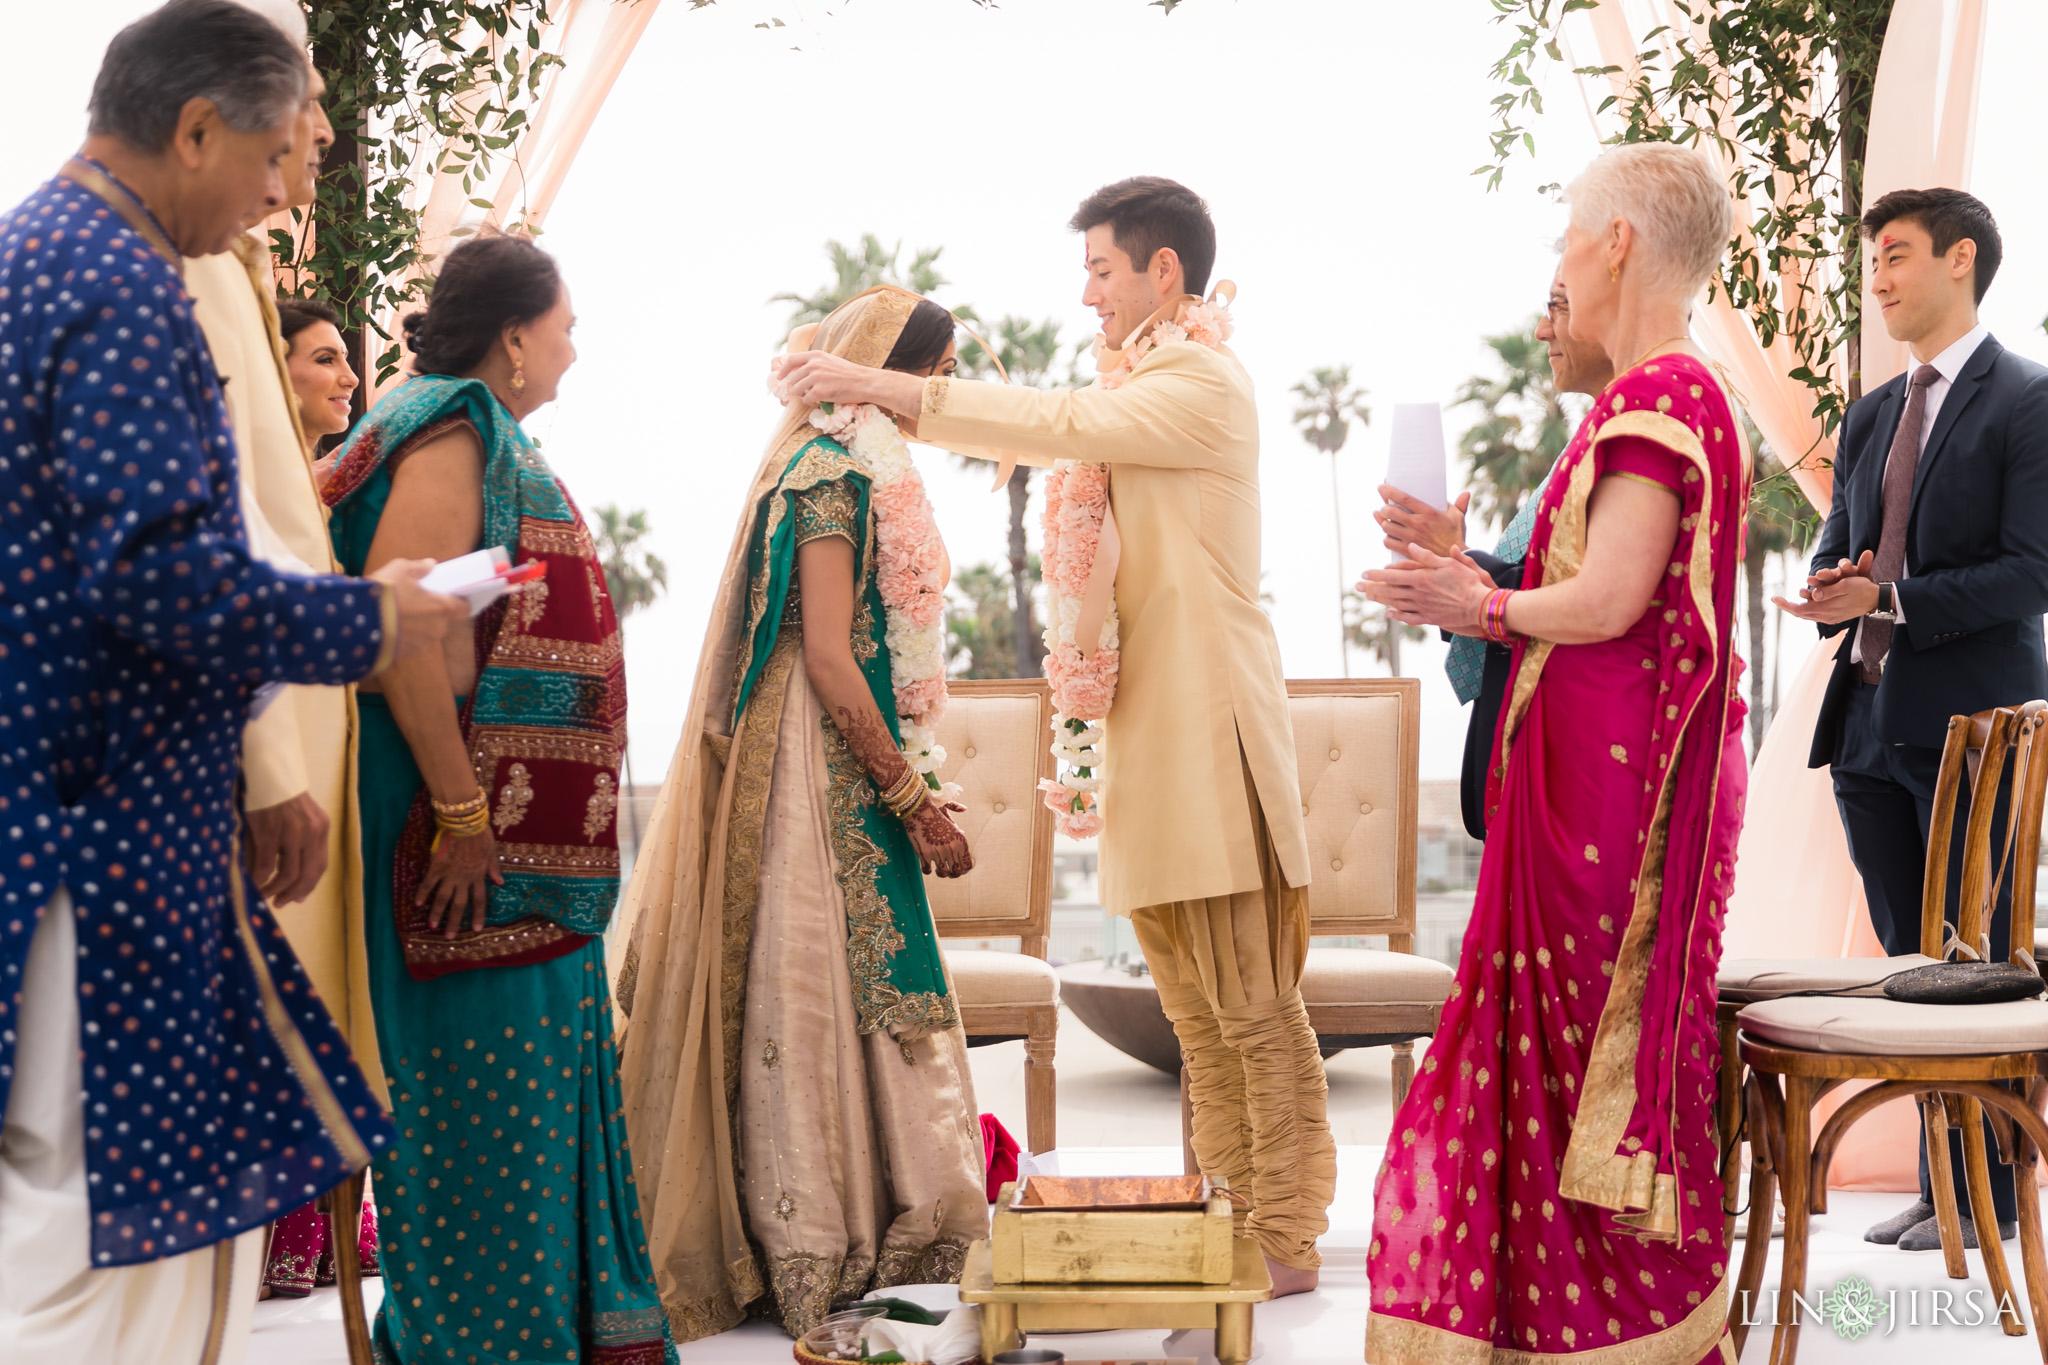 28 pasea hotel and spa huntington beach indian wedding ceremony photography